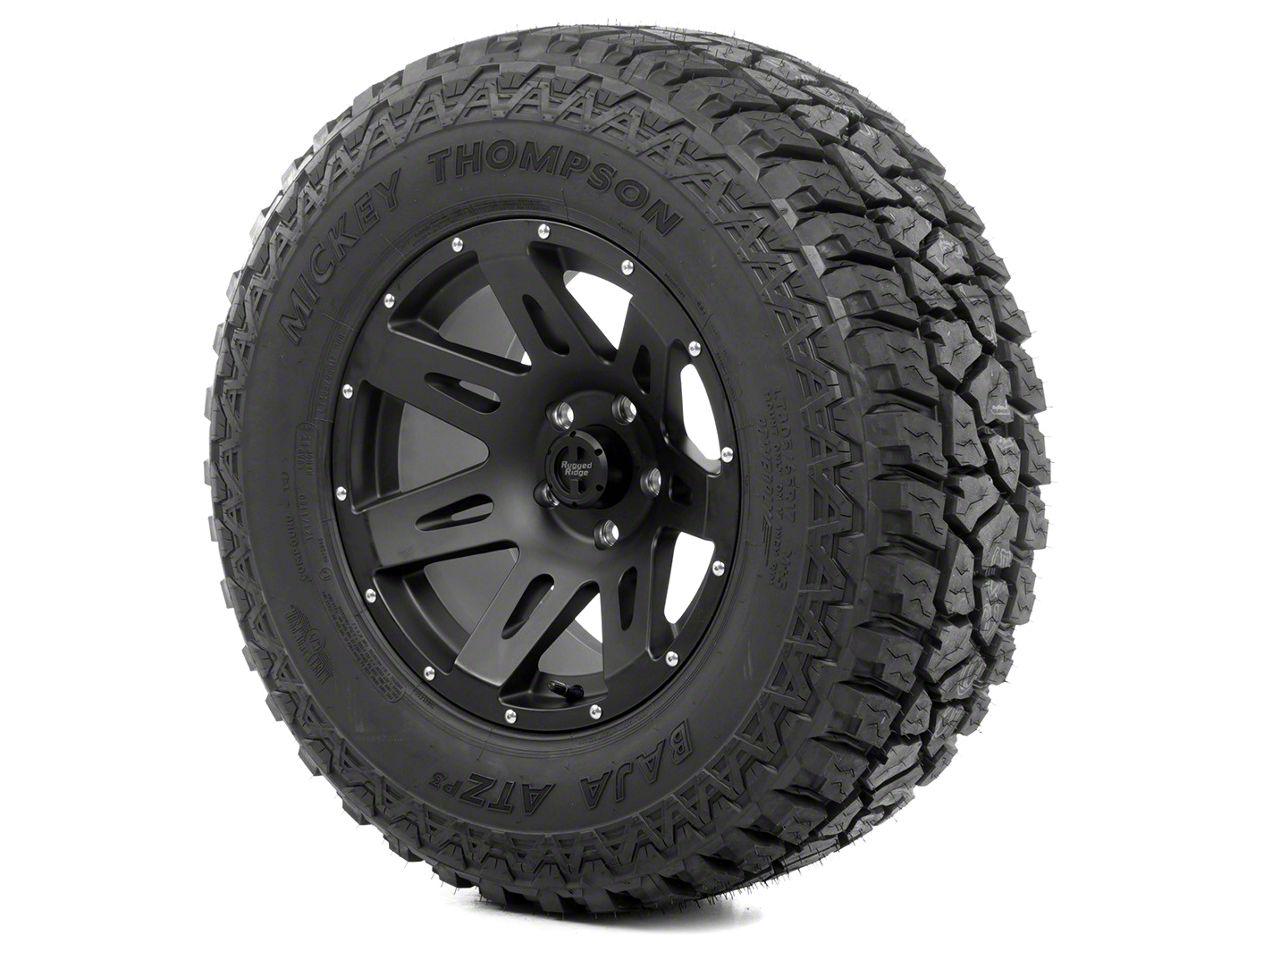 Rugged Ridge XHD Wheel 17x9 Black Satin and Mickey Thompson ATZ P3 315/70R17 Tire Kit (07-12 Jeep Wrangler JK)